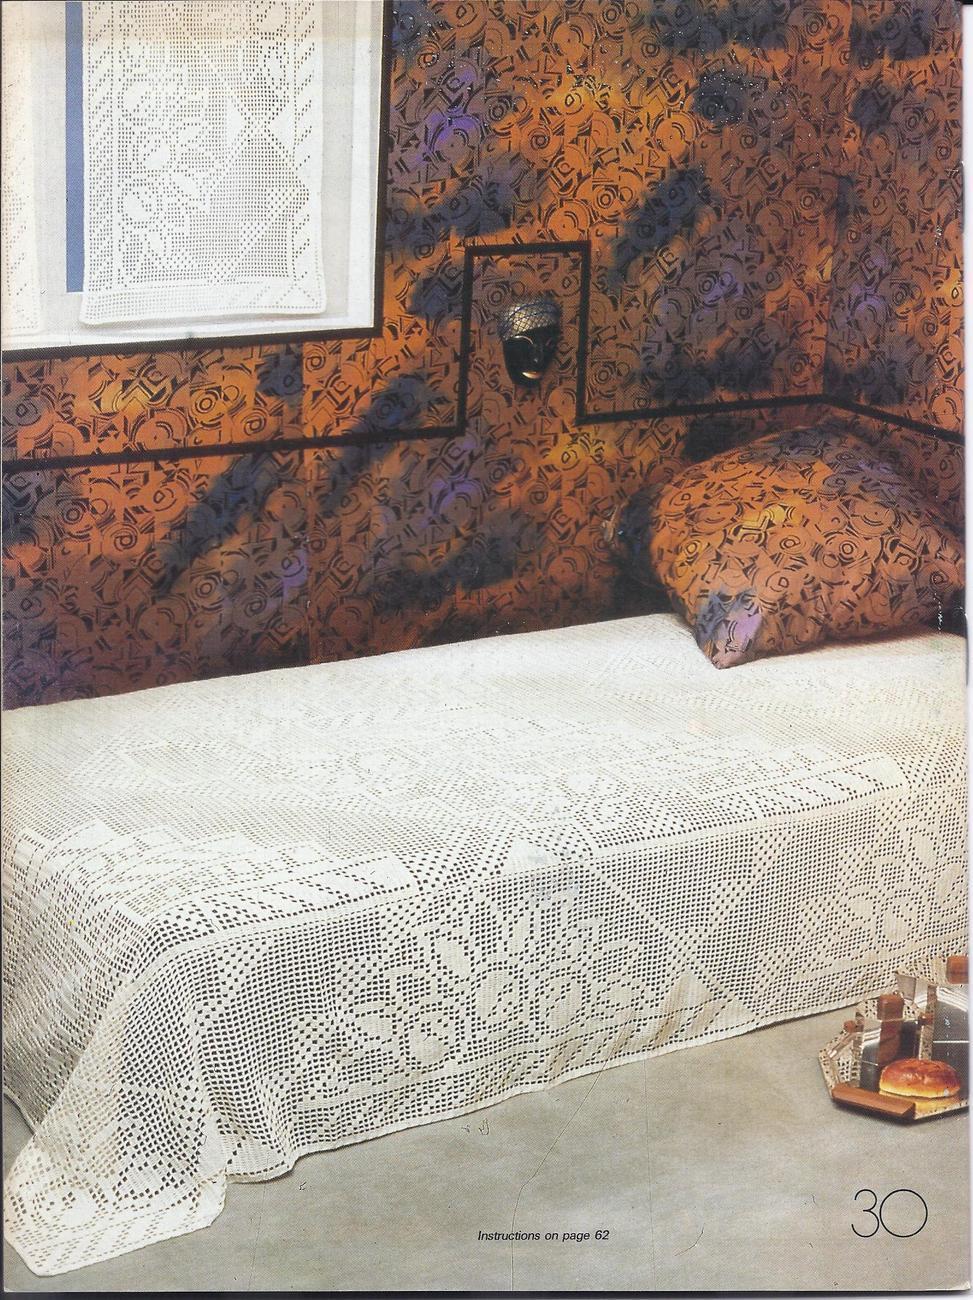 Decorative Crochet Pattern Magazine #21~~30 Patterns